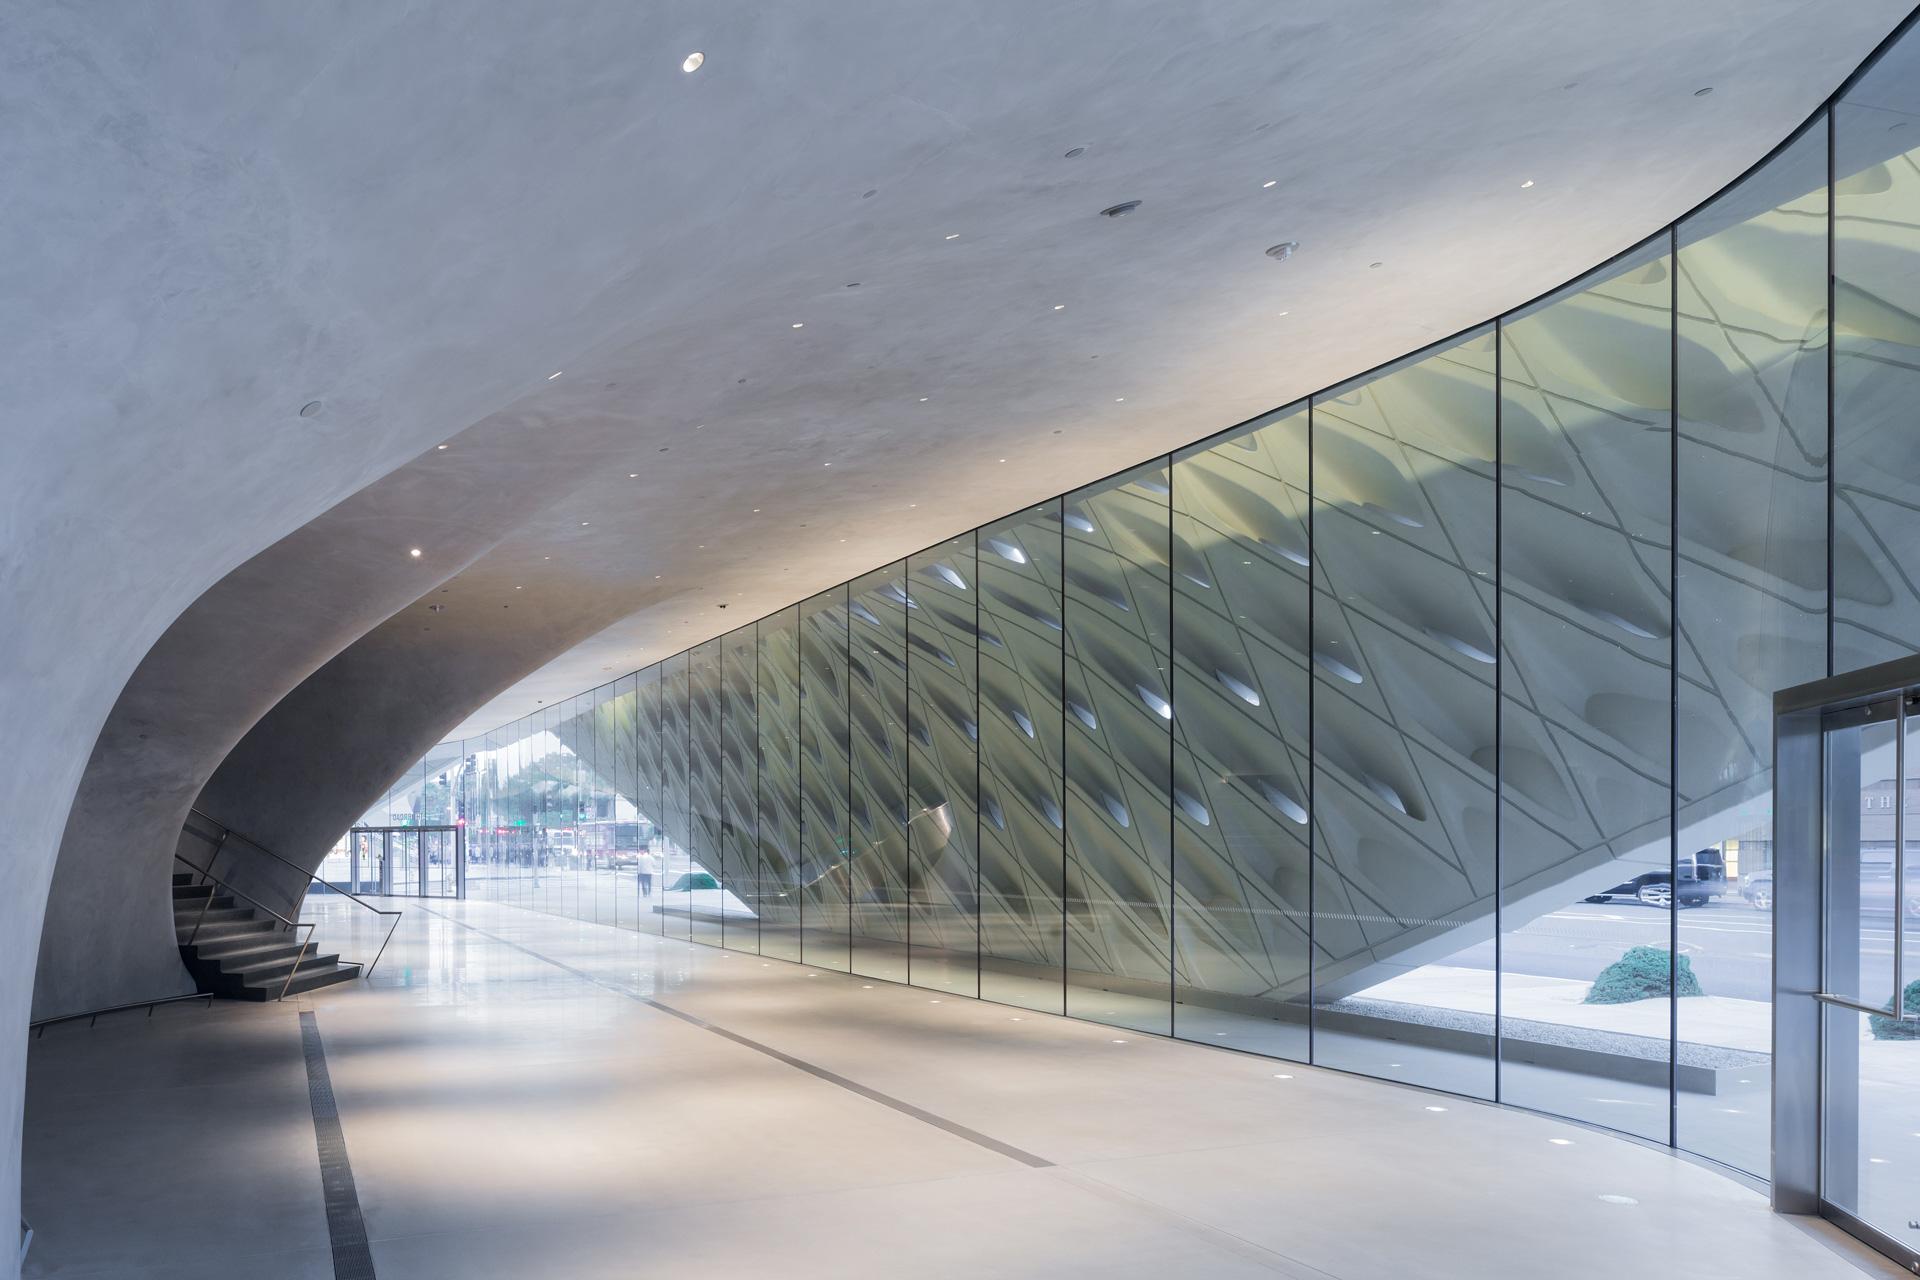 Interni del museo ( (courtesy photo: Iwan Baan)